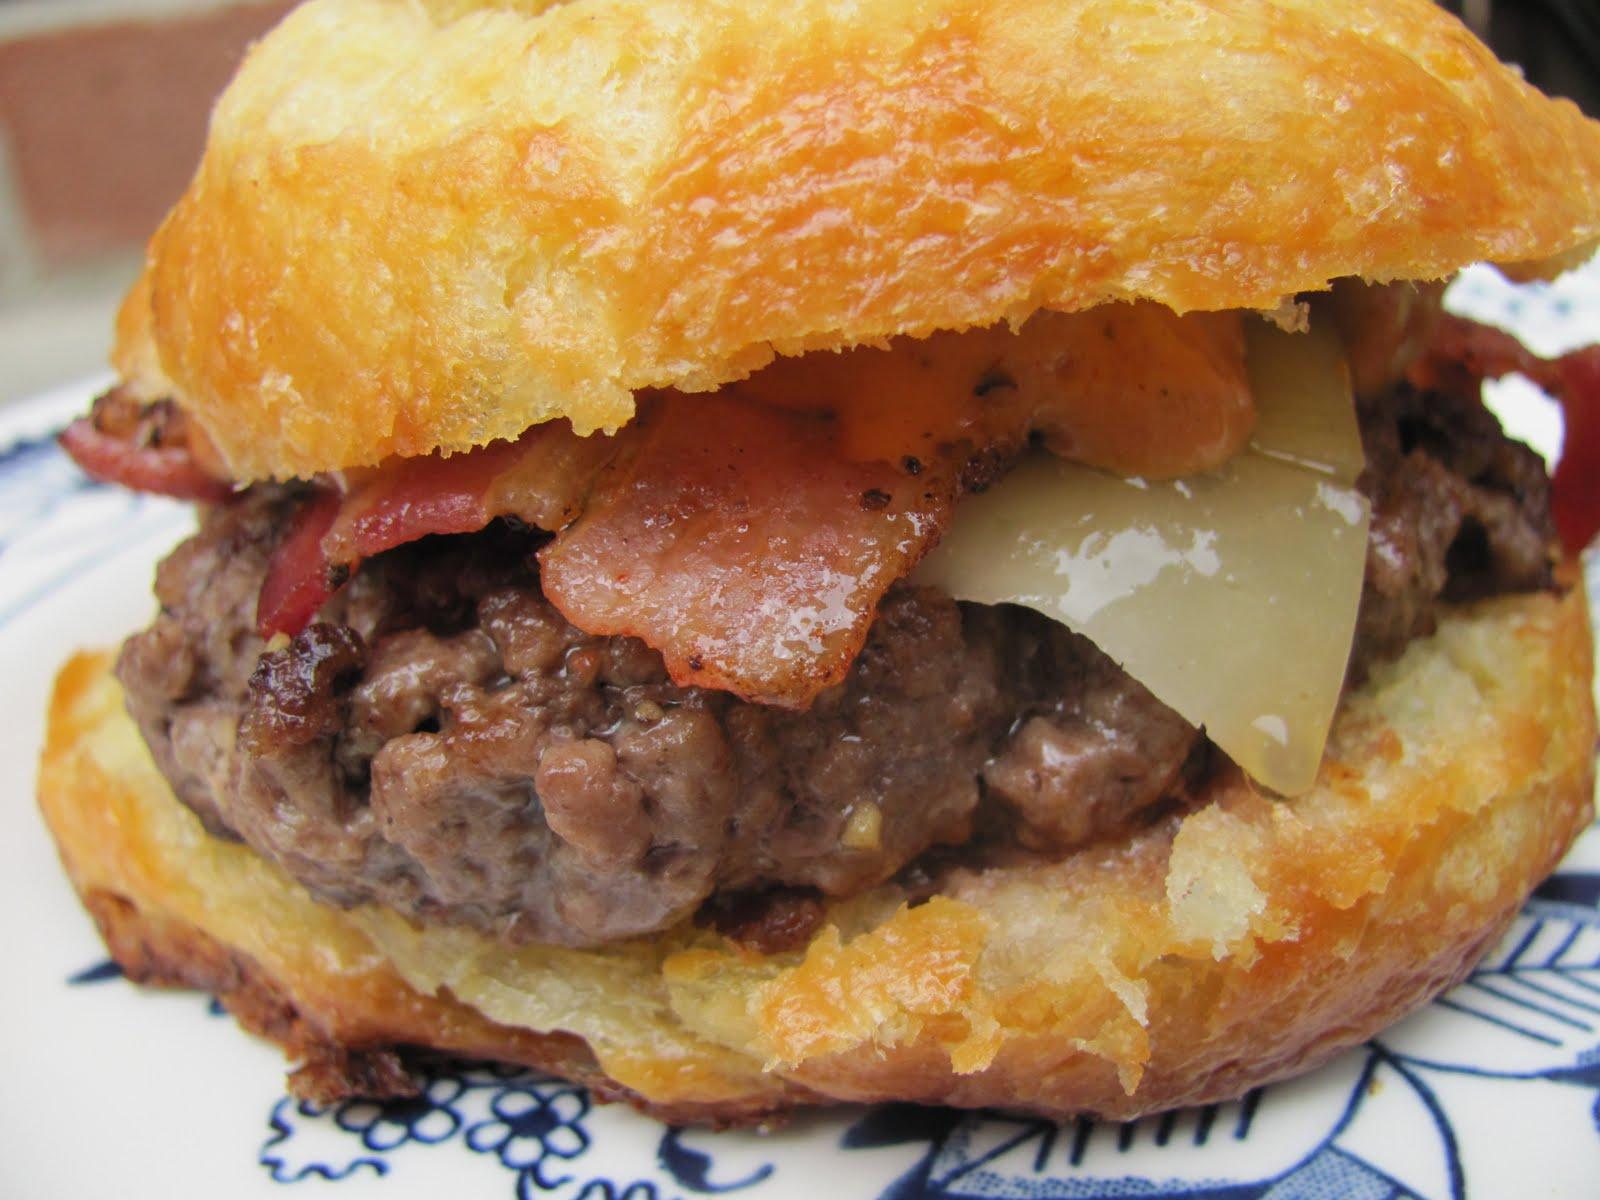 Foodette Reviews: Anniversary Asparagus, Brioche Burgers ...